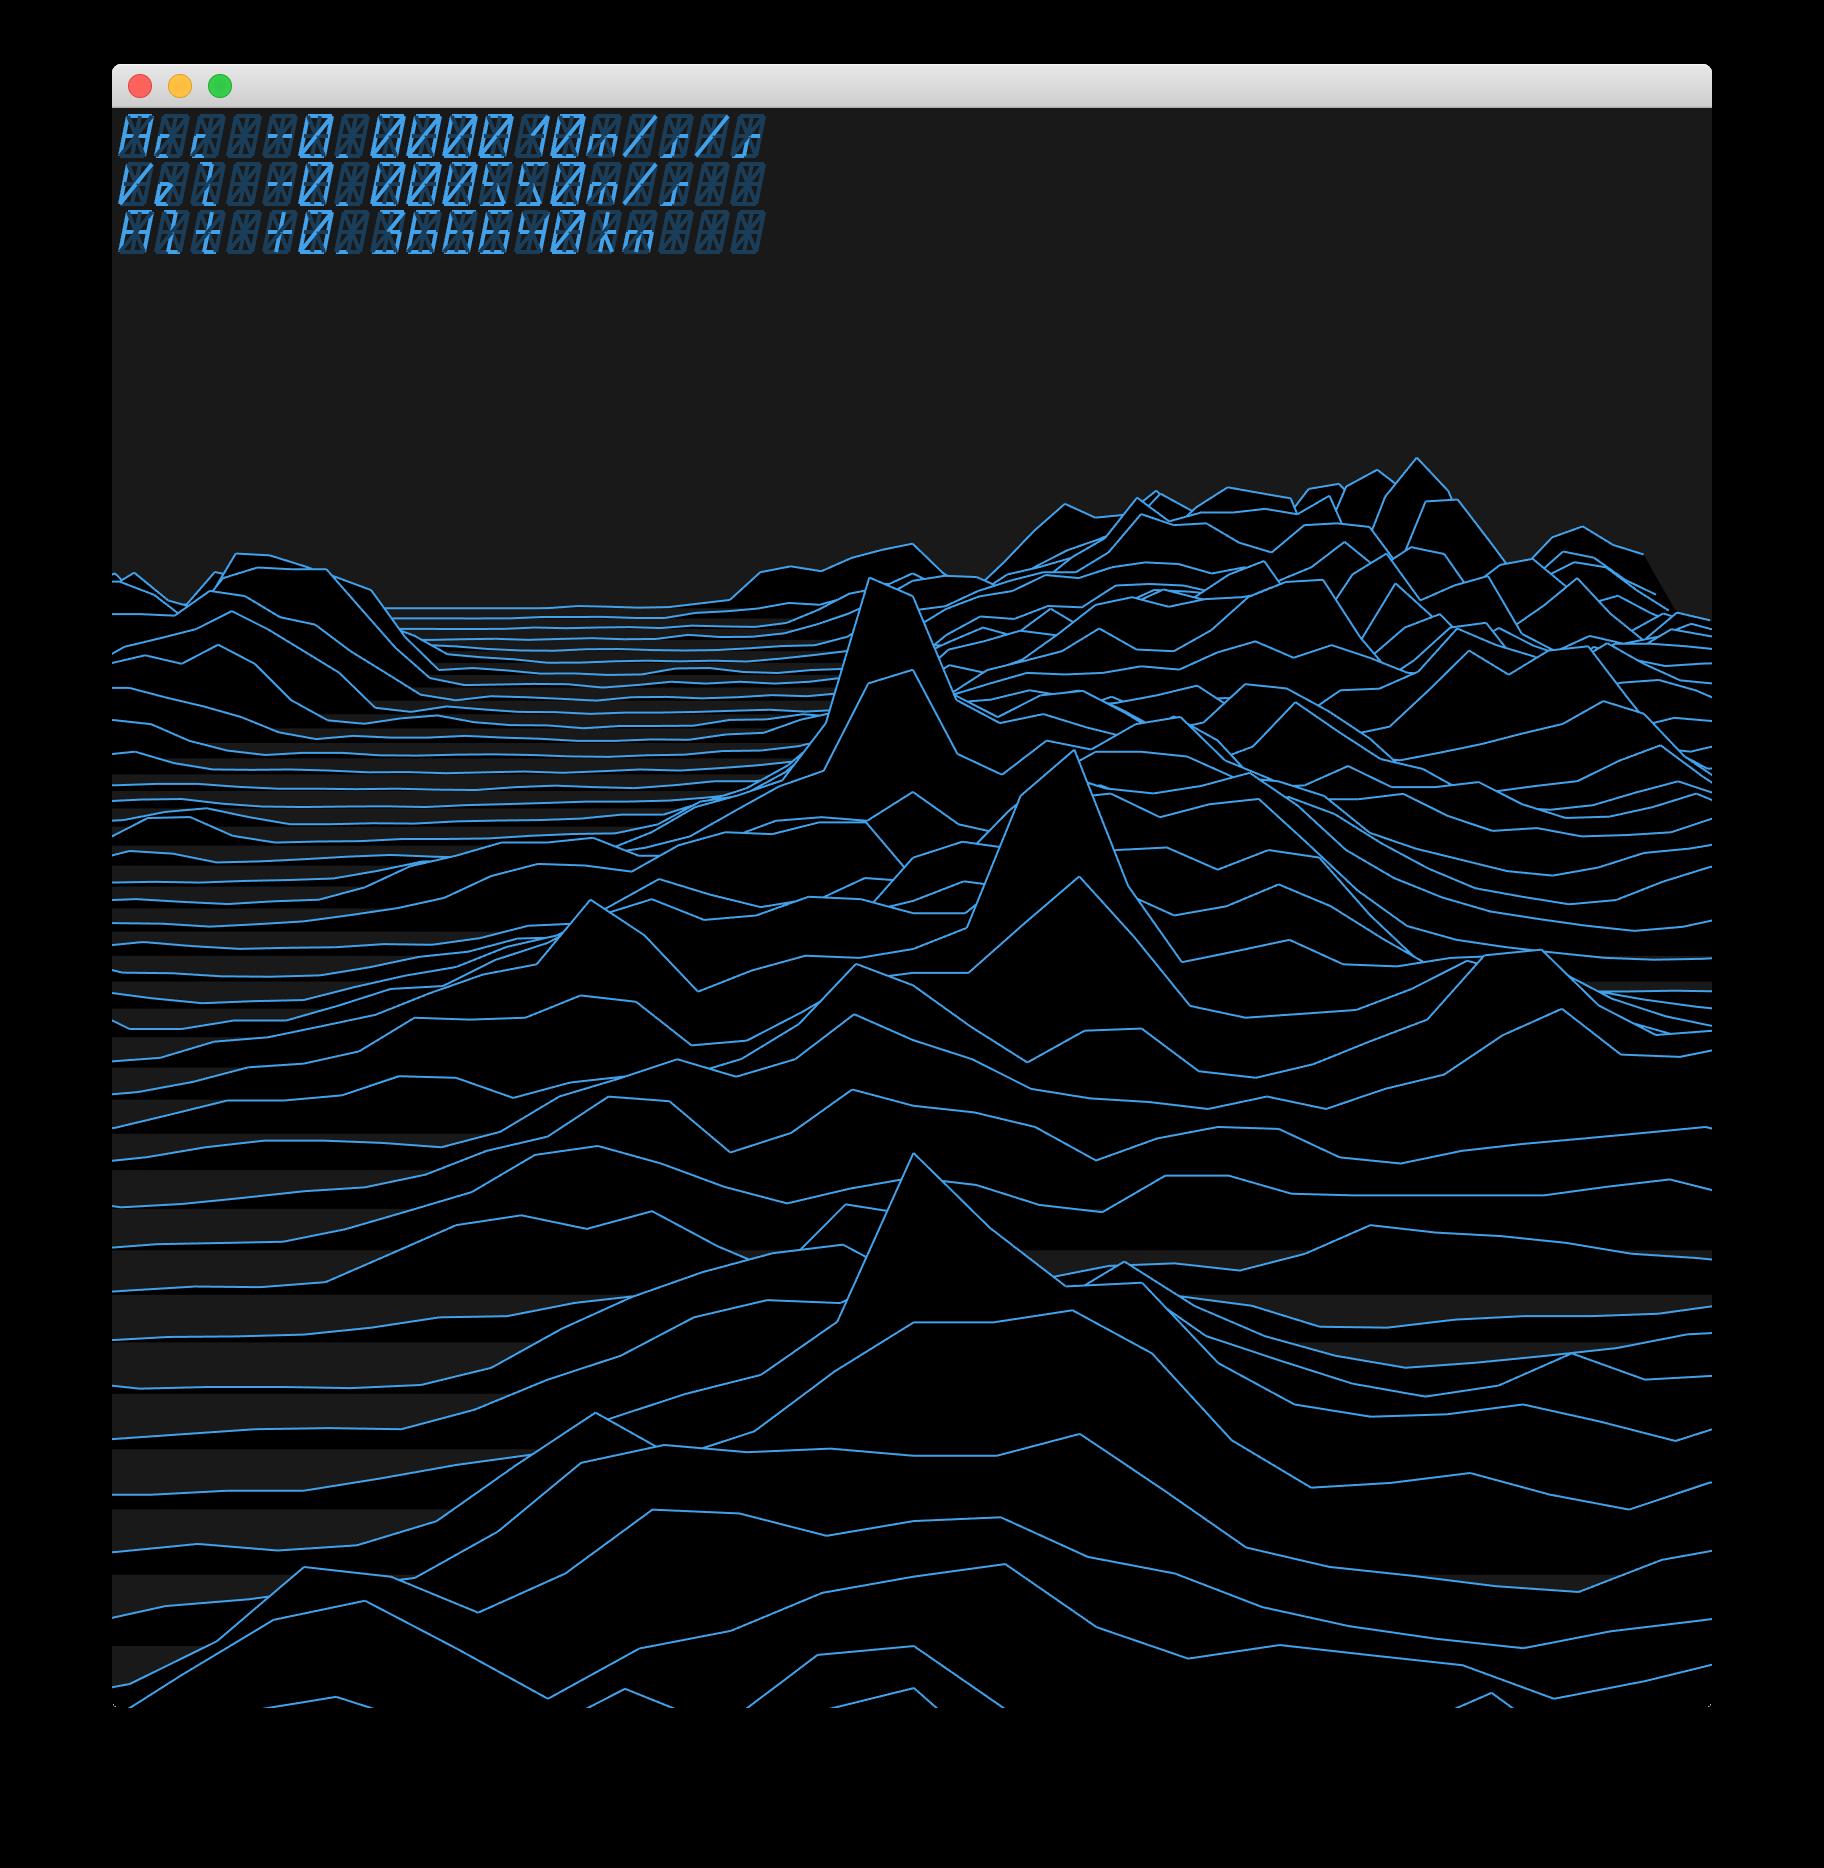 screenshot 2014-11-06 23 36 55